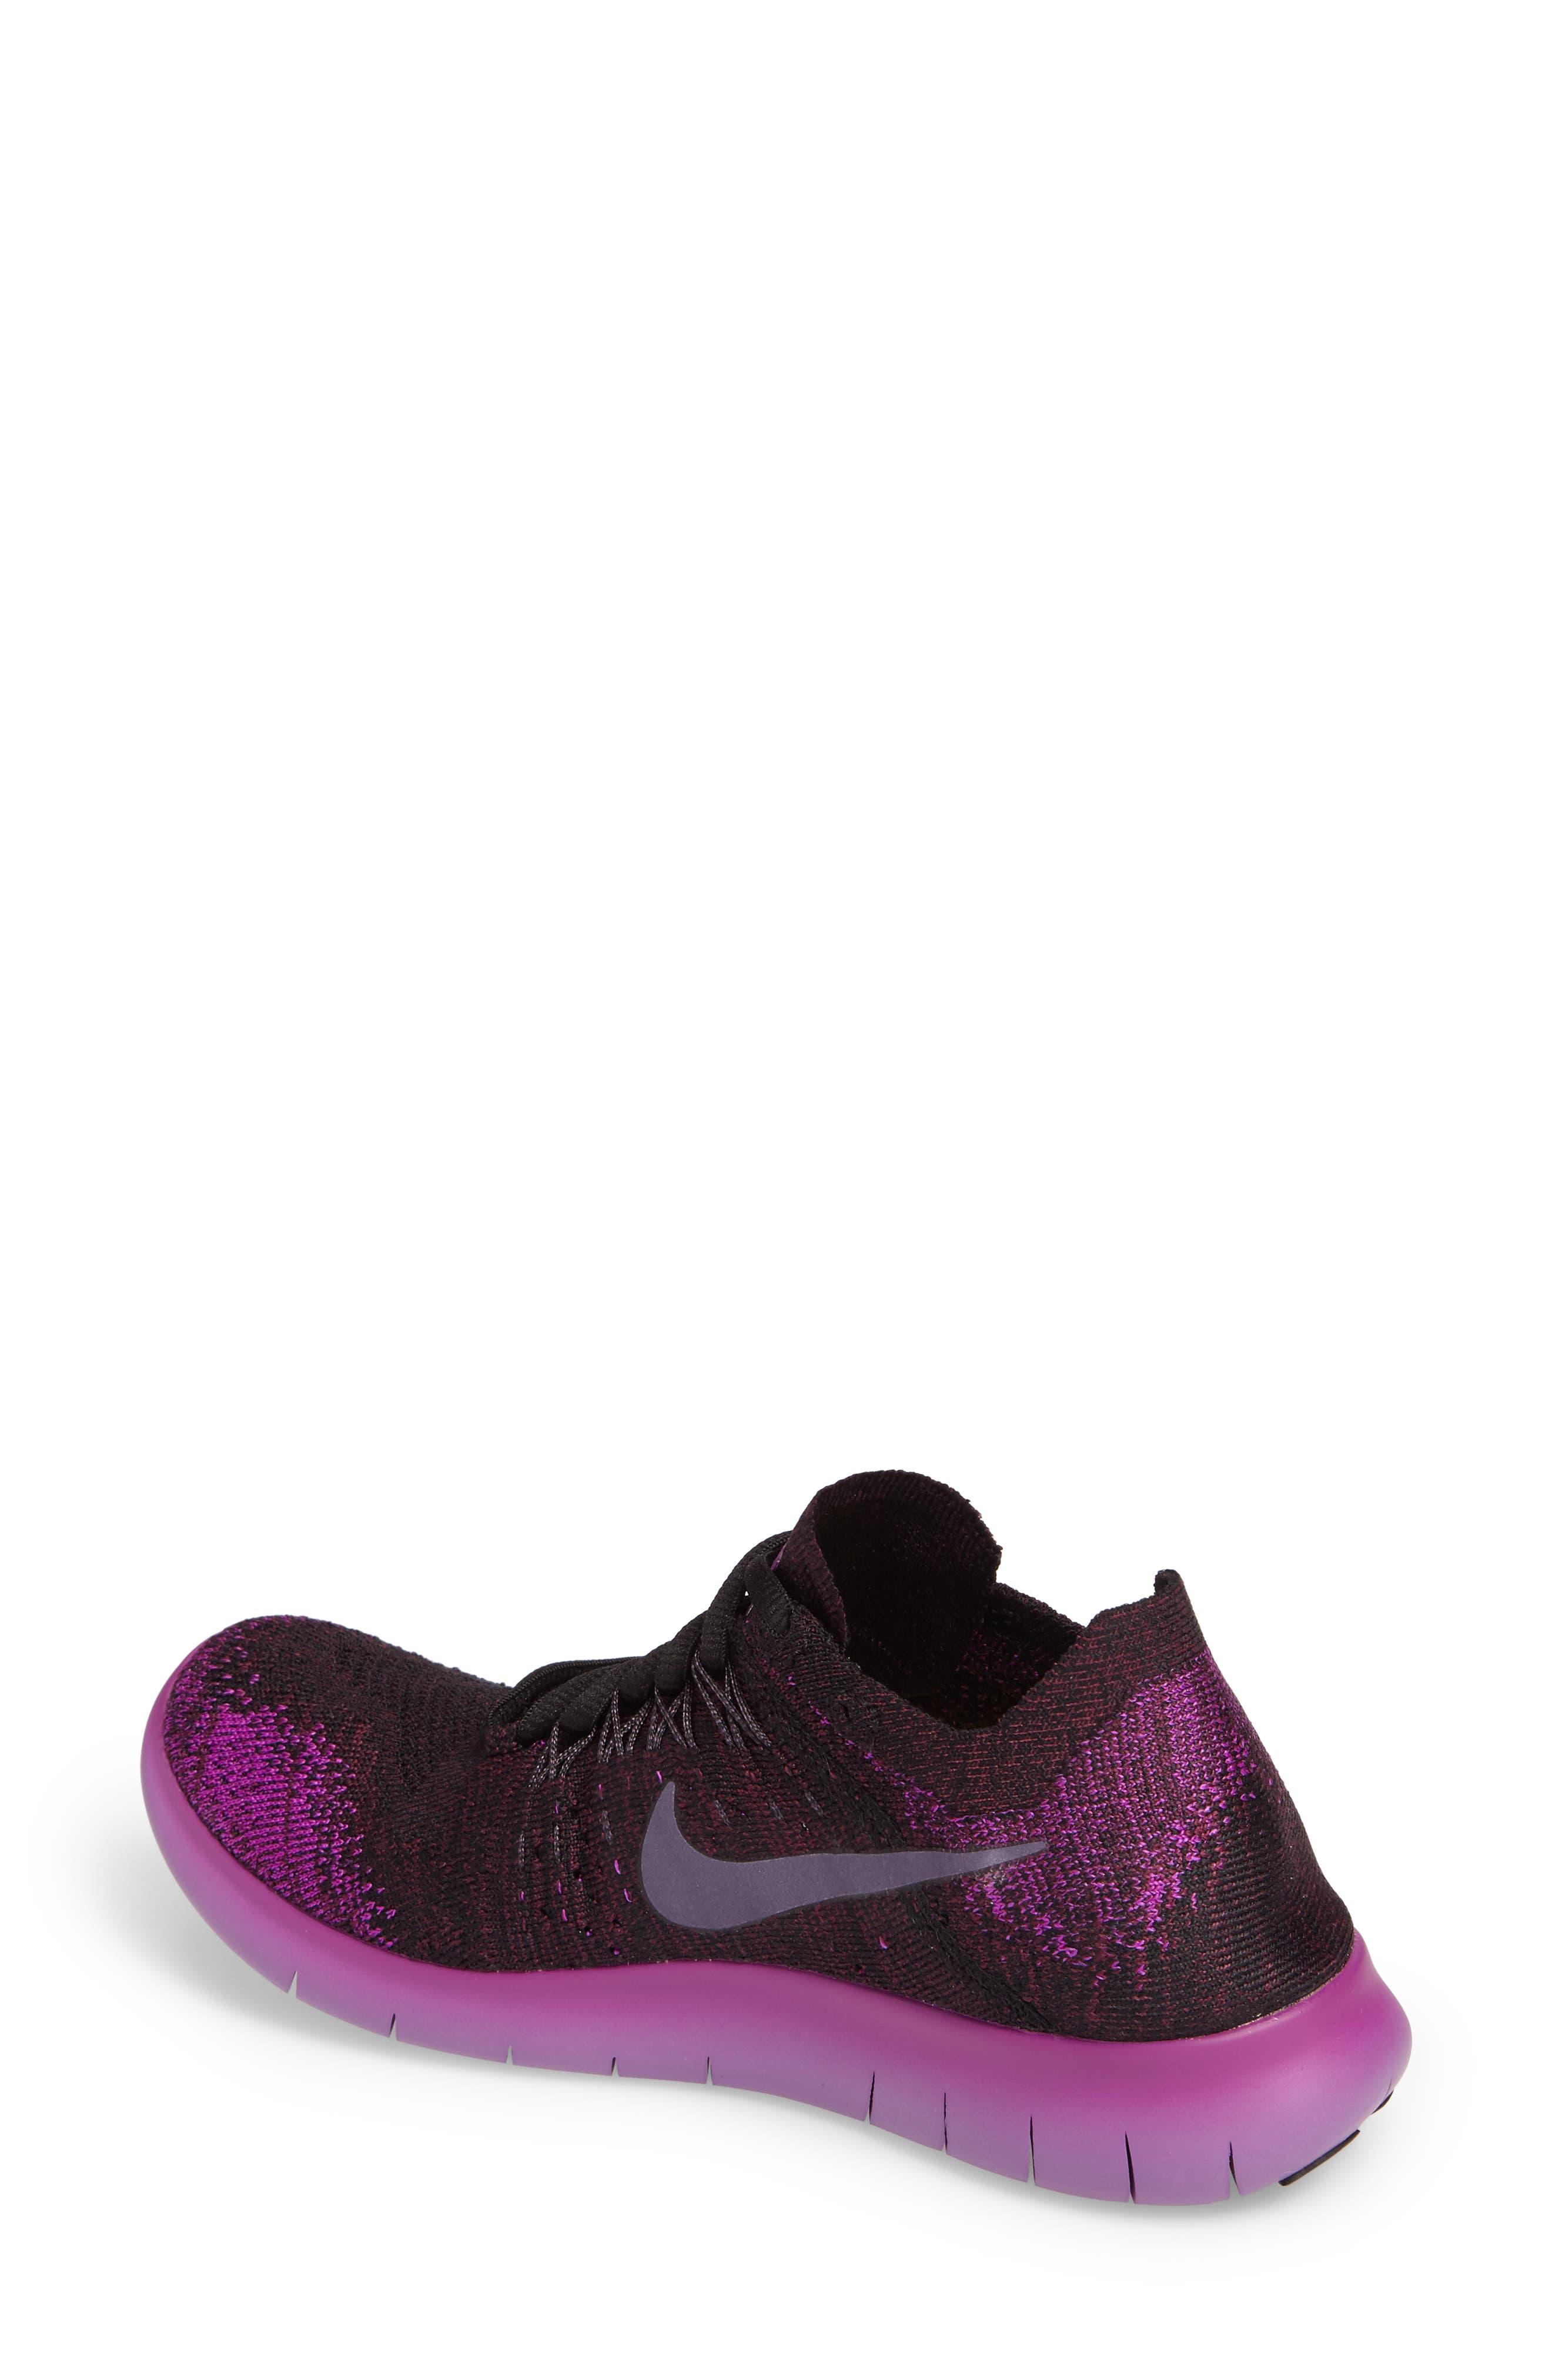 Alternate Image 2  - Nike Free Run Flyknit 2 Running Shoe (Women)